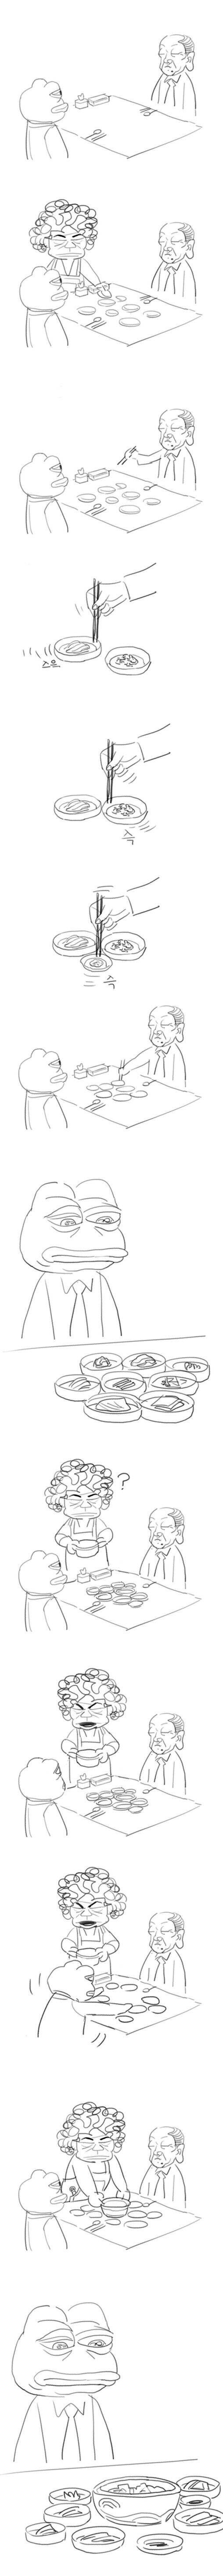 1.jpg 상사랑 밥 먹는.manhwa